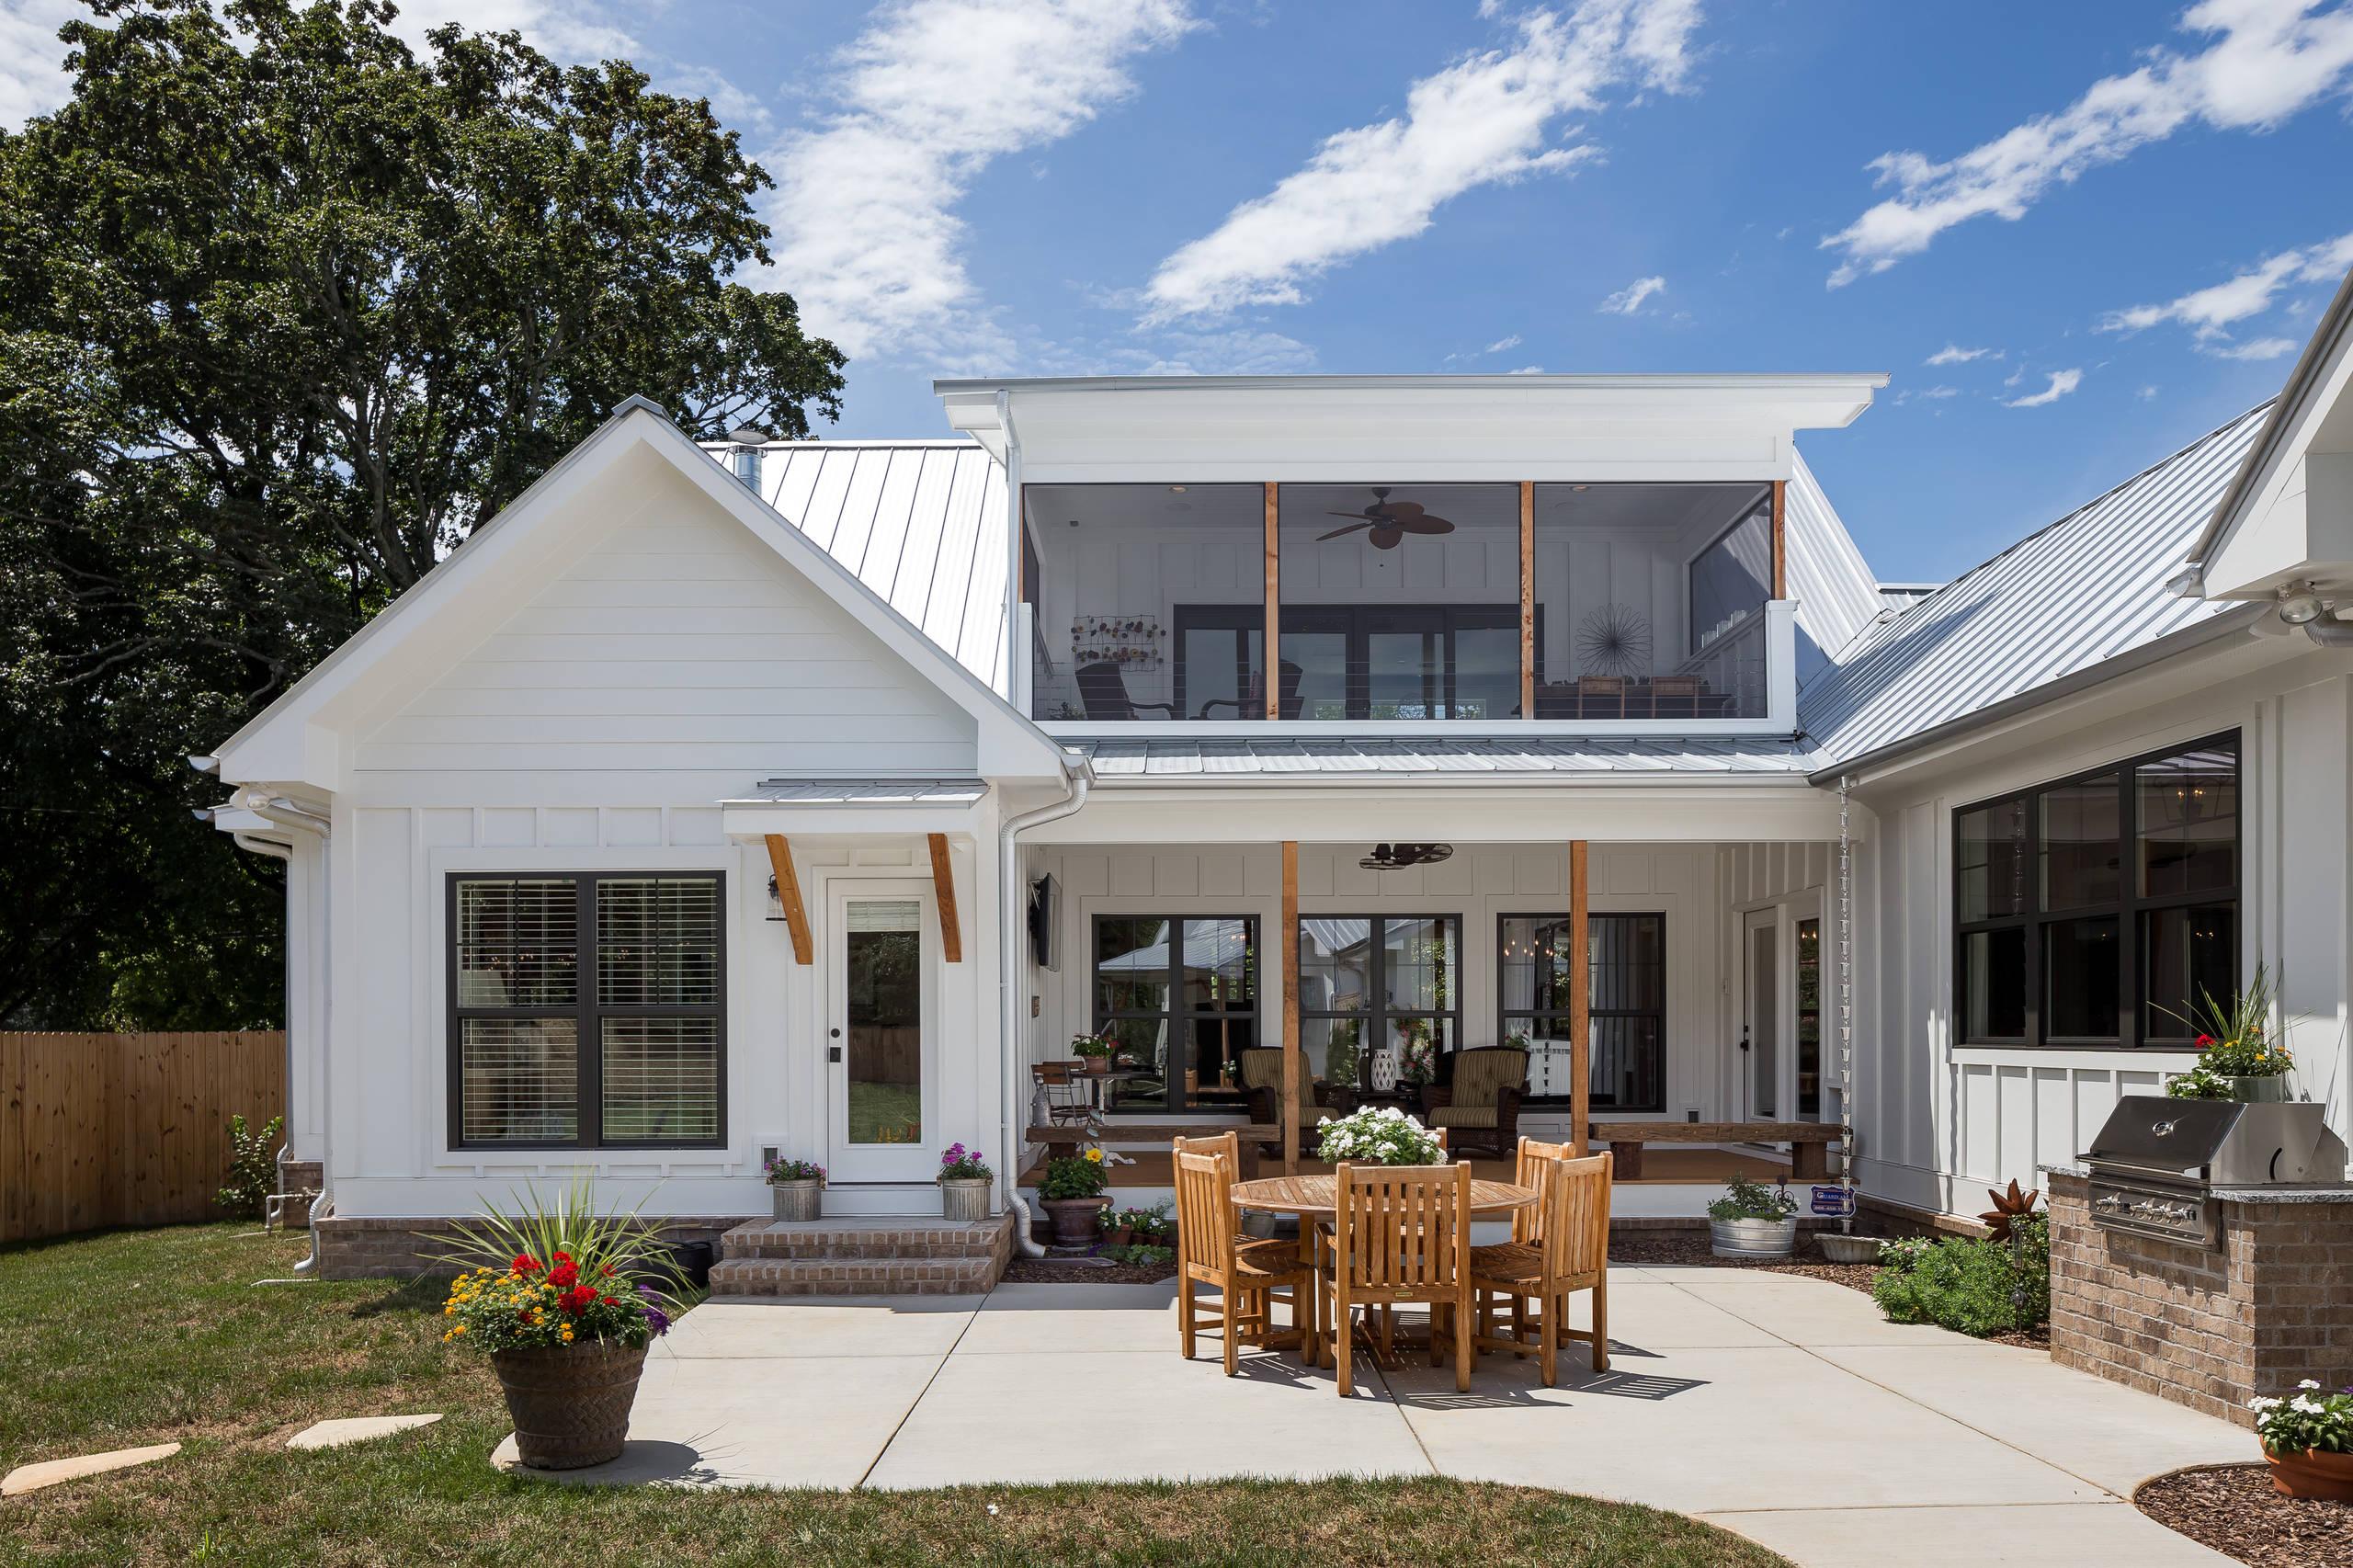 75 Beautiful Farmhouse Outdoor Kitchen Design Houzz Pictures Ideas April 2021 Houzz